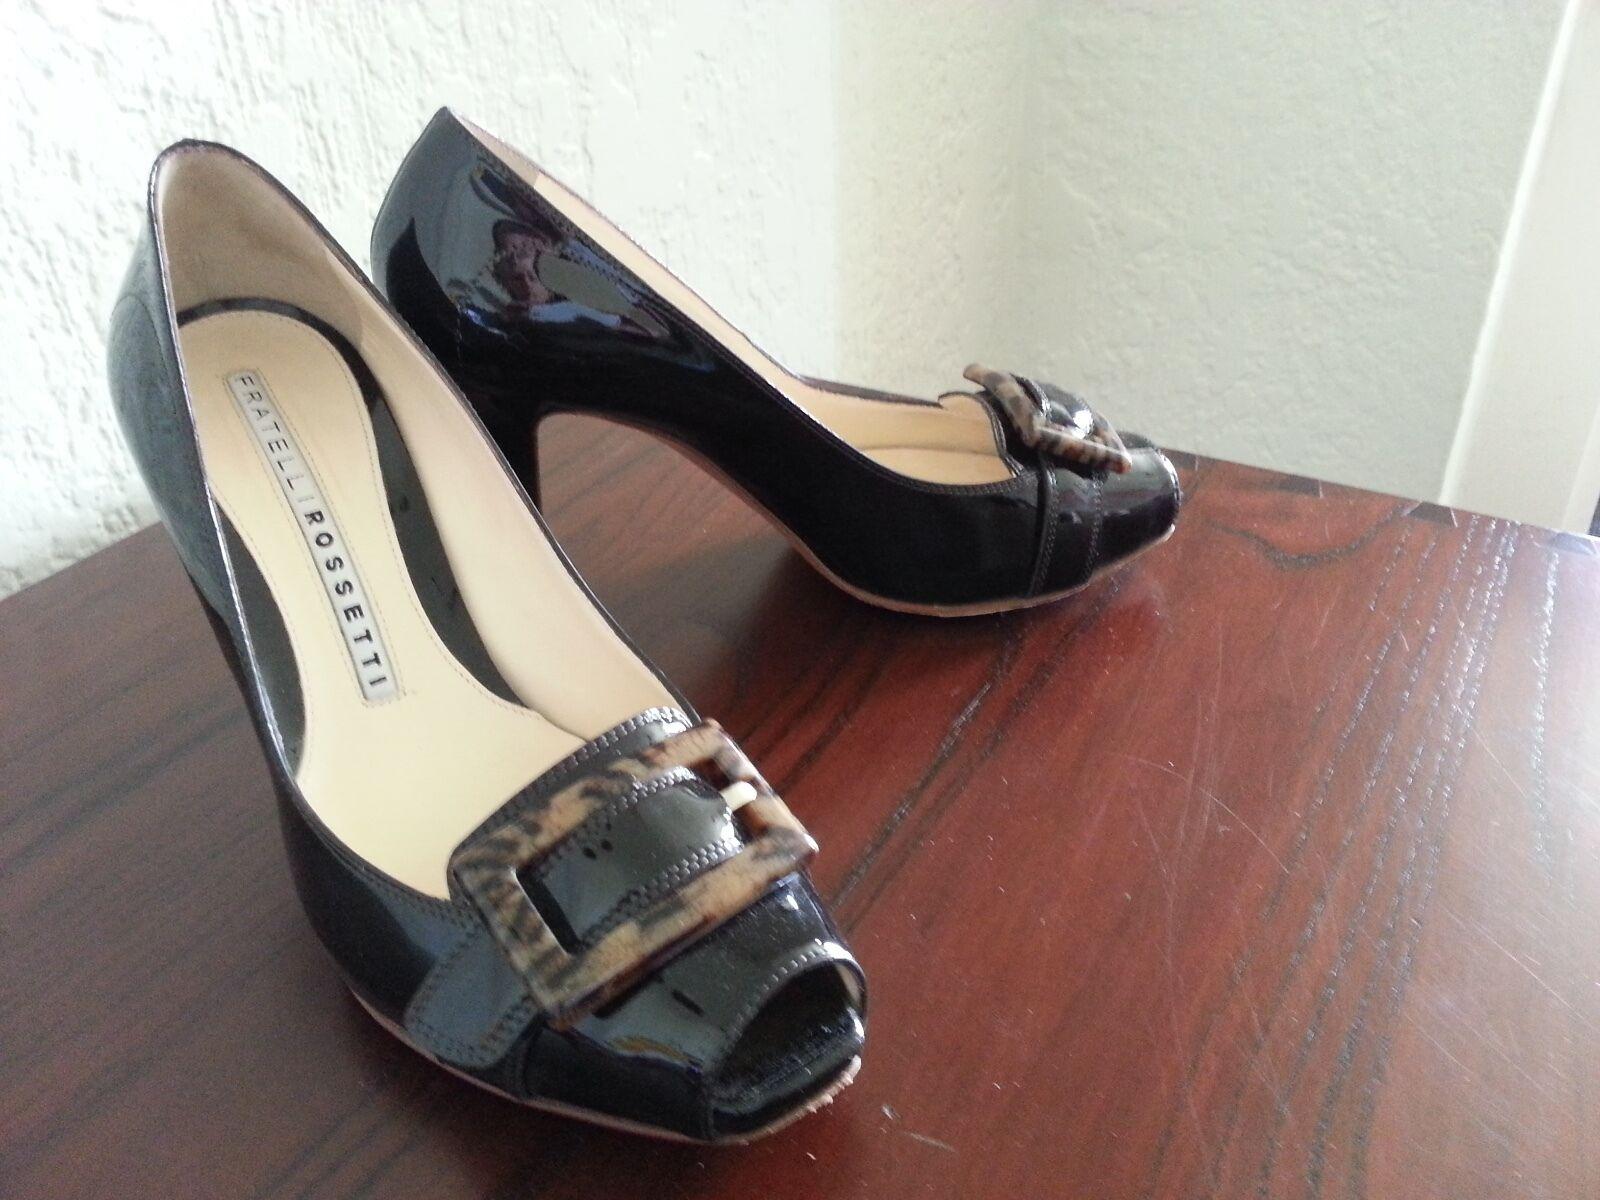 shopping online di moda Fratelli Rossetti Peep-toe Pumps, Pumps, Pumps, Dimensione 38.5 (8.5)  protezione post-vendita